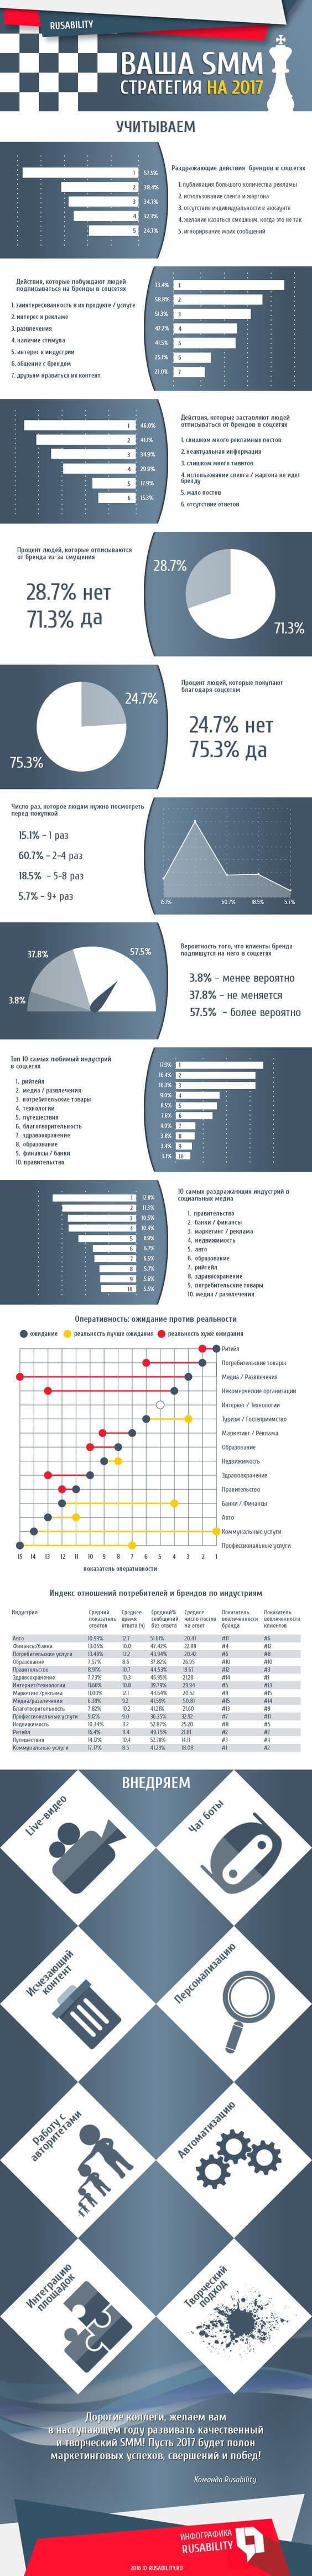 шпаргалка по smm, инфографика